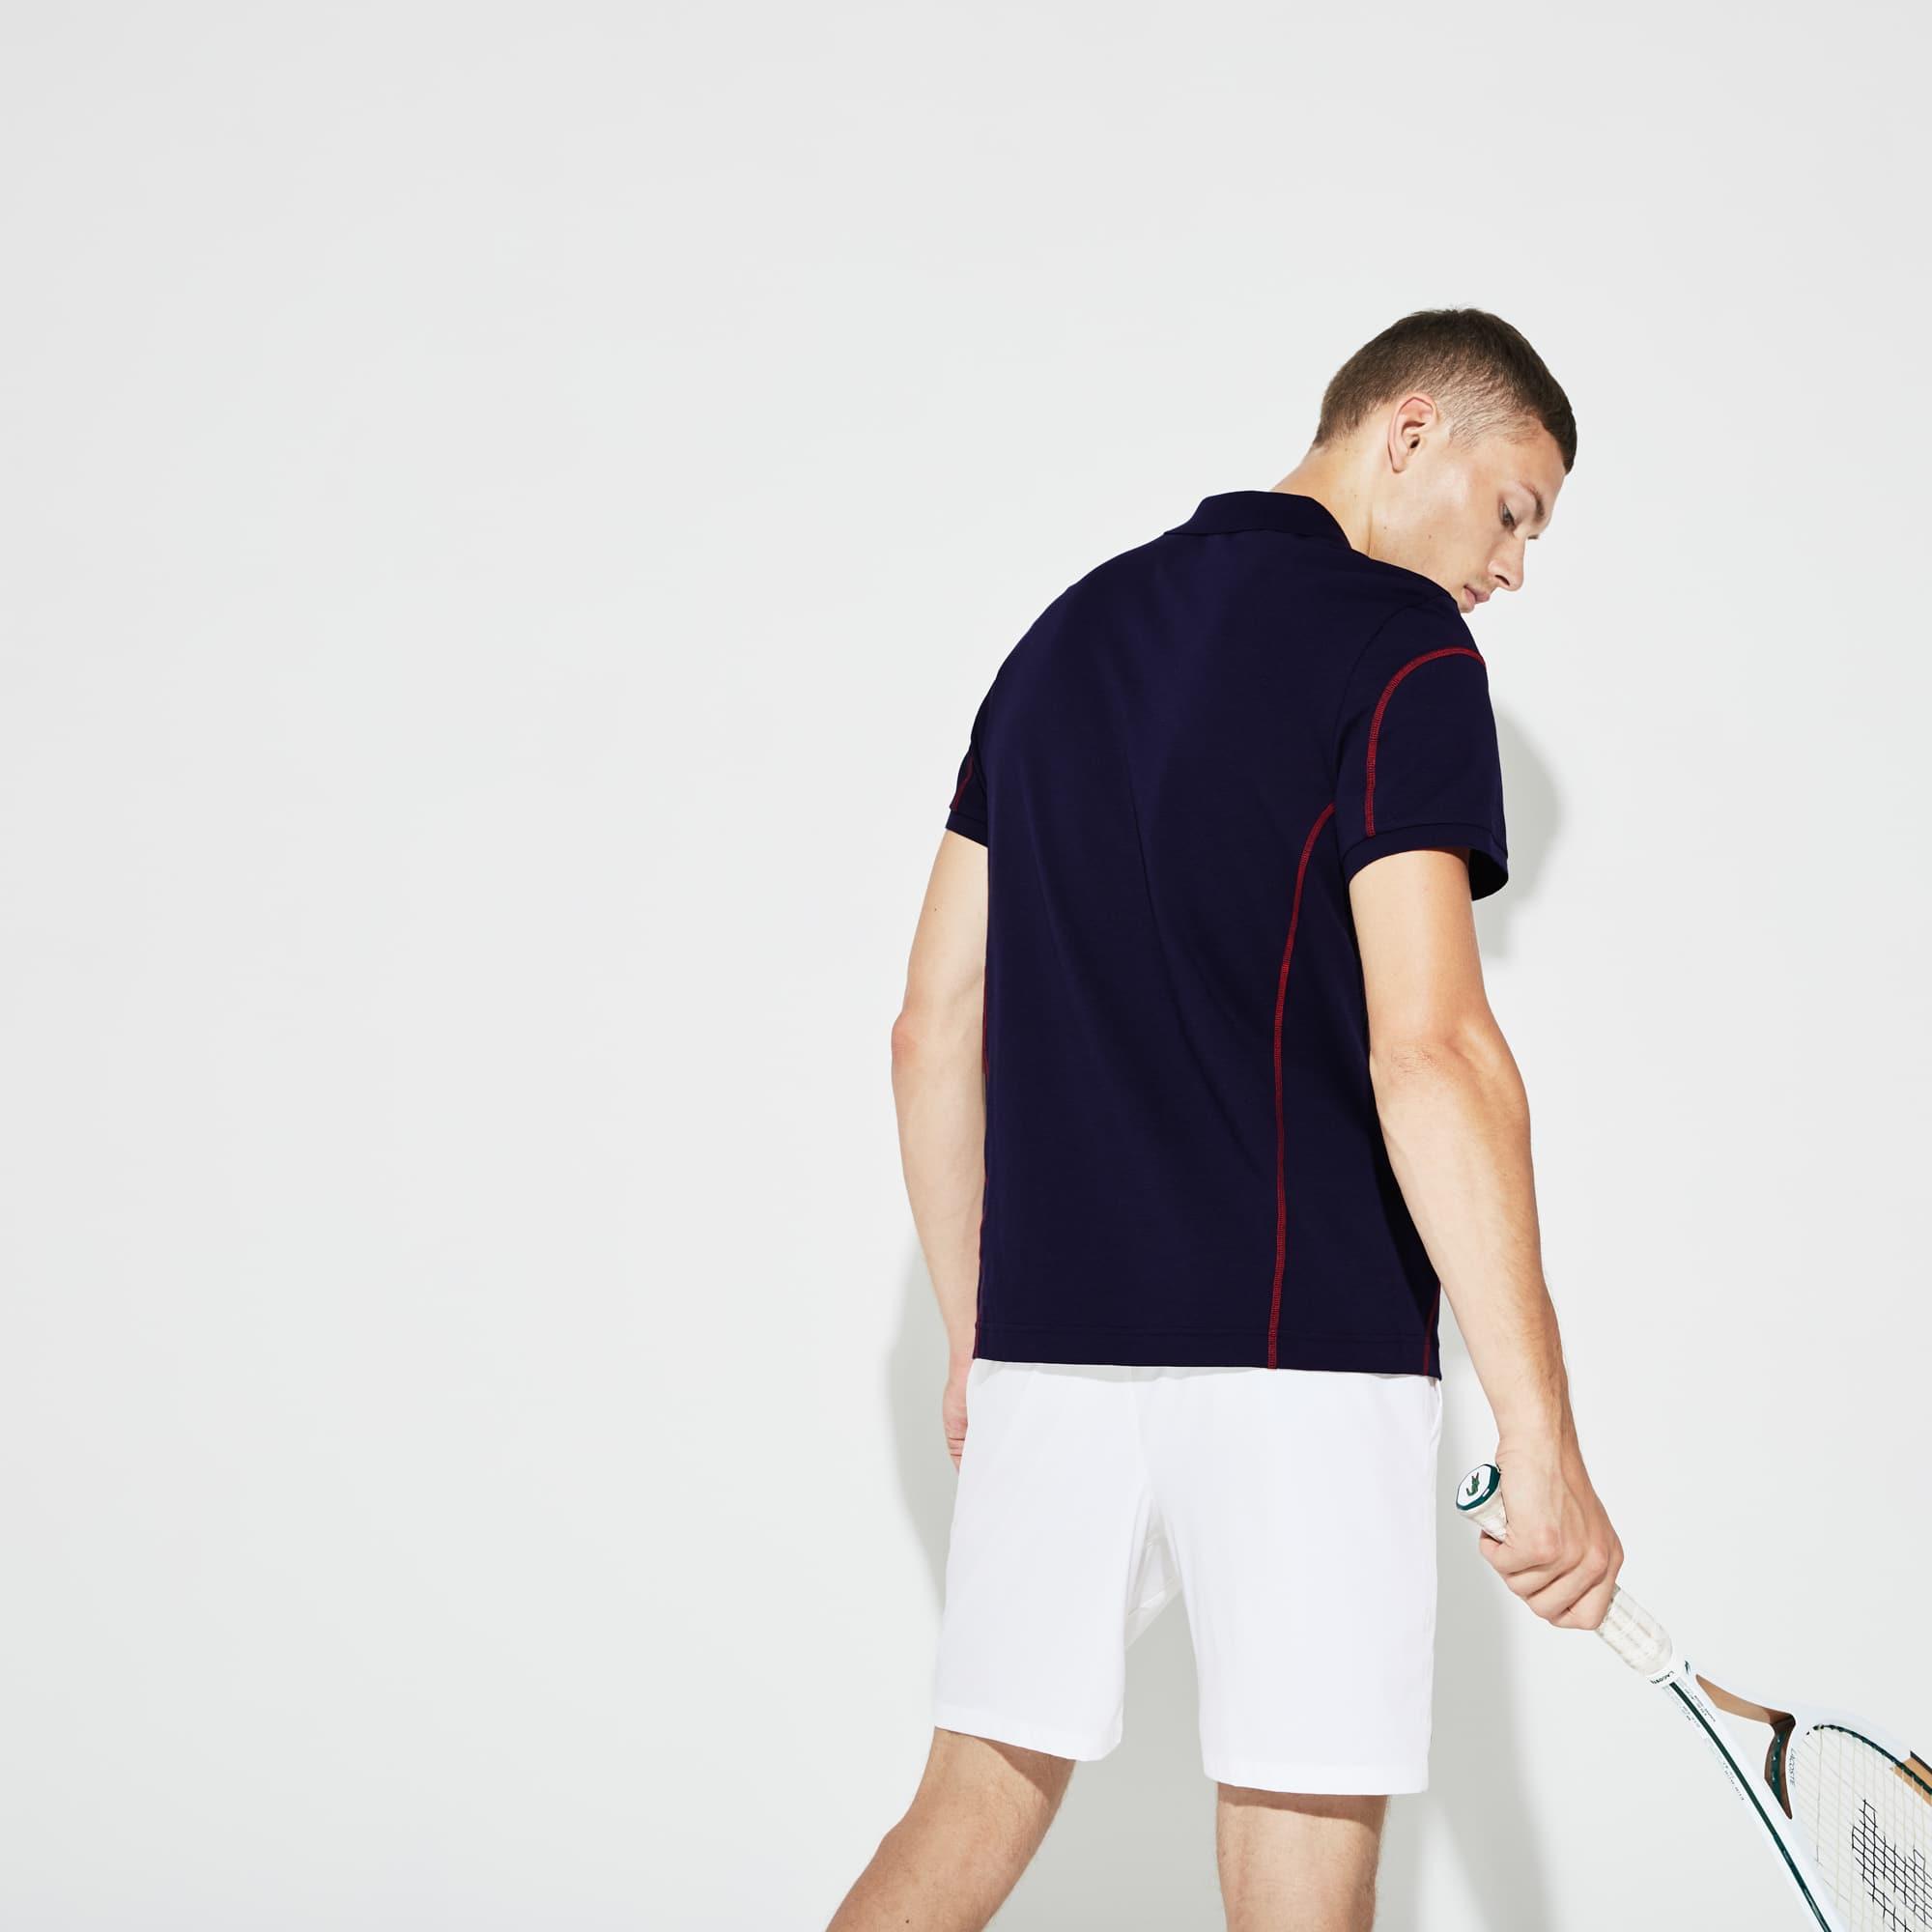 Tennis Stitching Cotton Light Sport Men's PoloLacoste Contrast IE2HWYD9